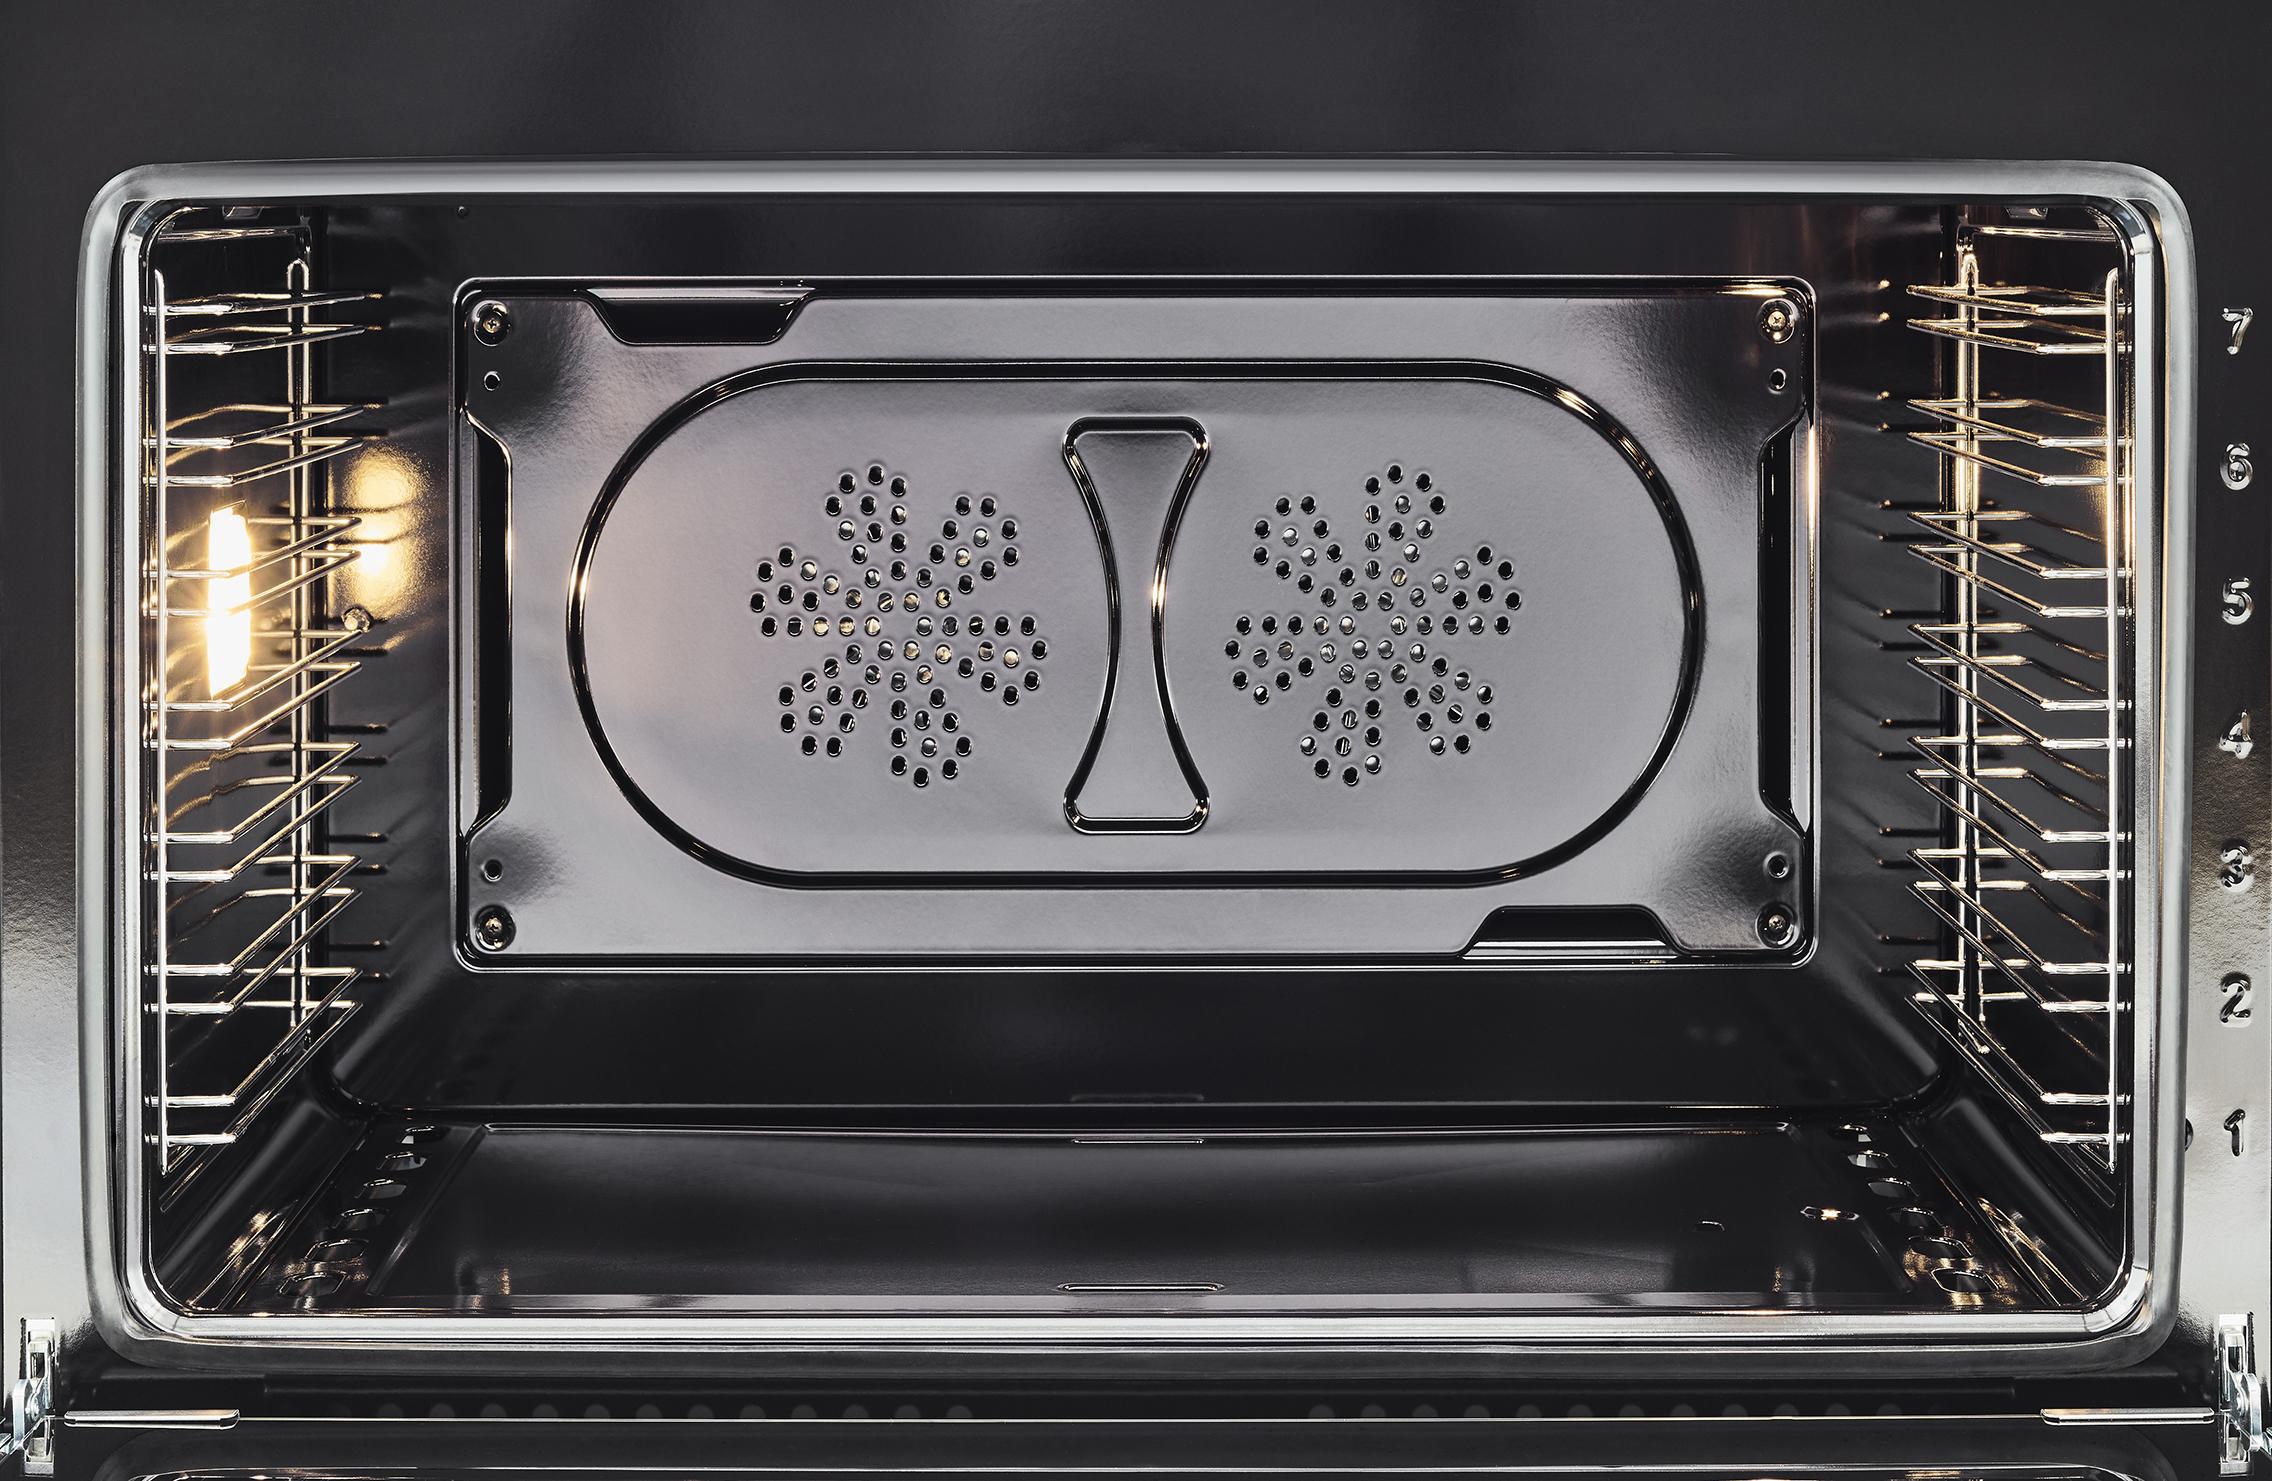 "Model: MAST305GASNEE   Bertazzoni 30"" Master Series range - Gas oven - 5 aluminum burners"